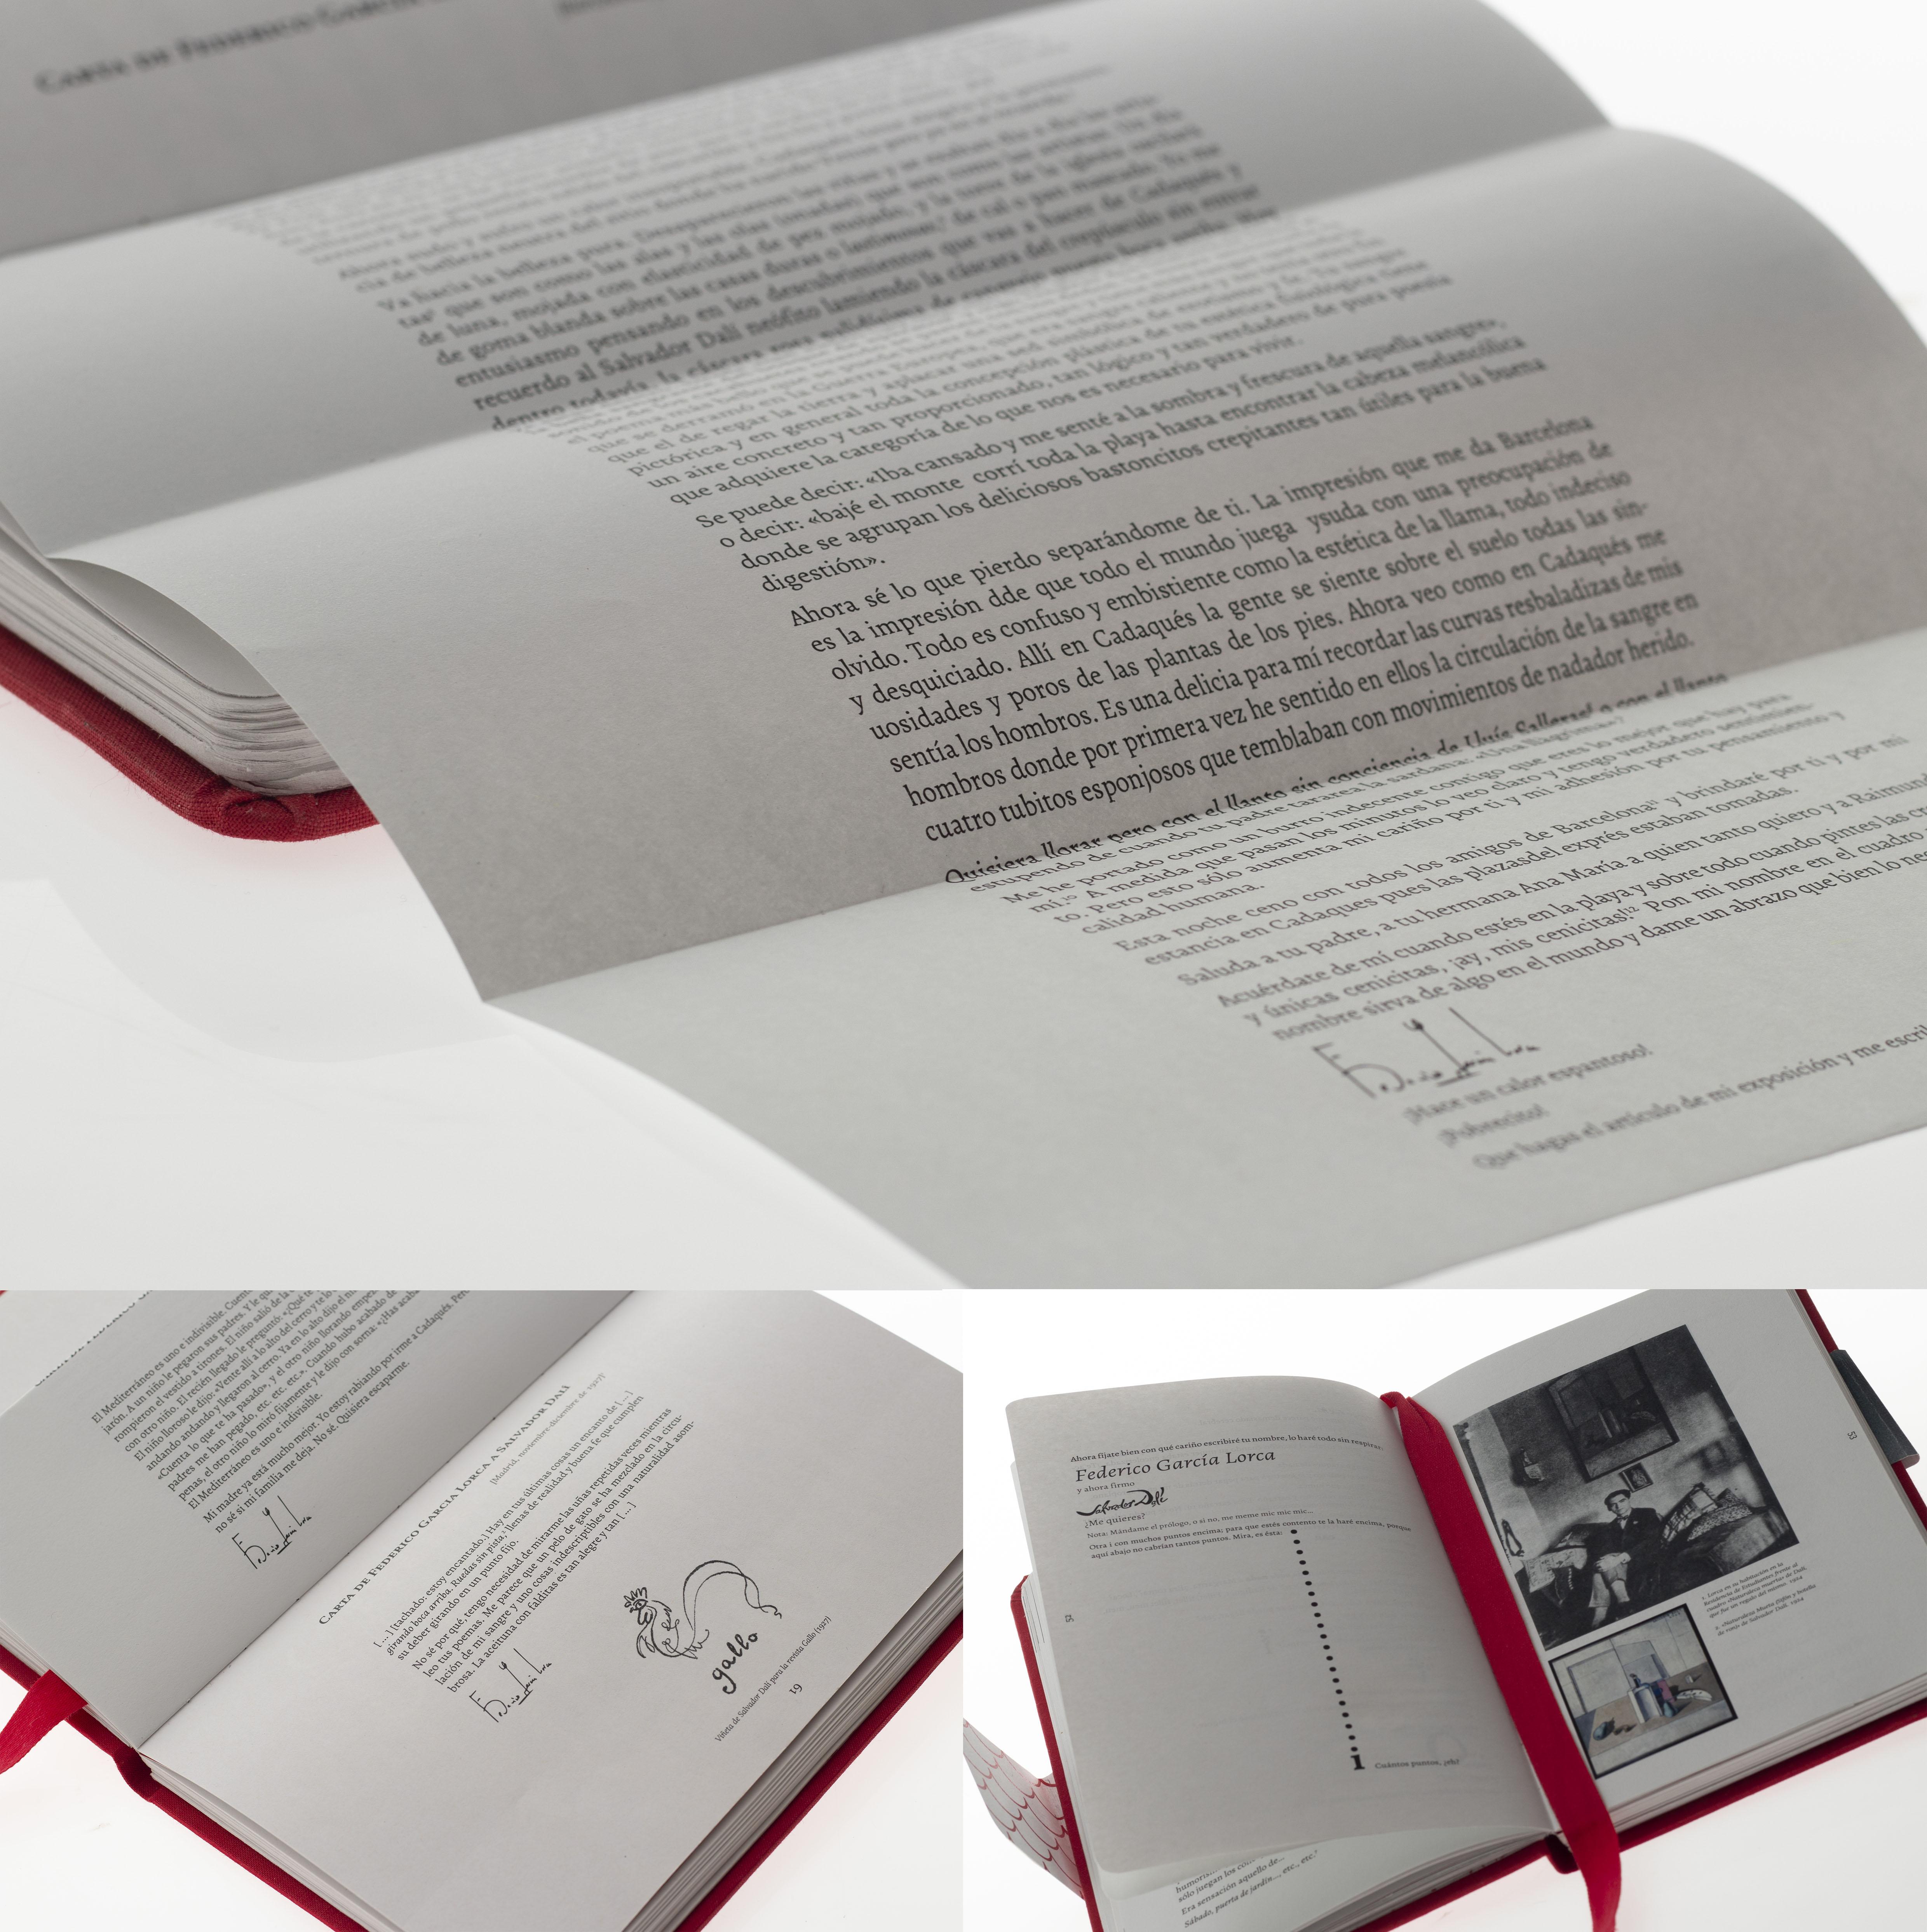 Querido Salvador, querido Lorquito — Cartas de amor by Anna Celda - Creative Work - $i